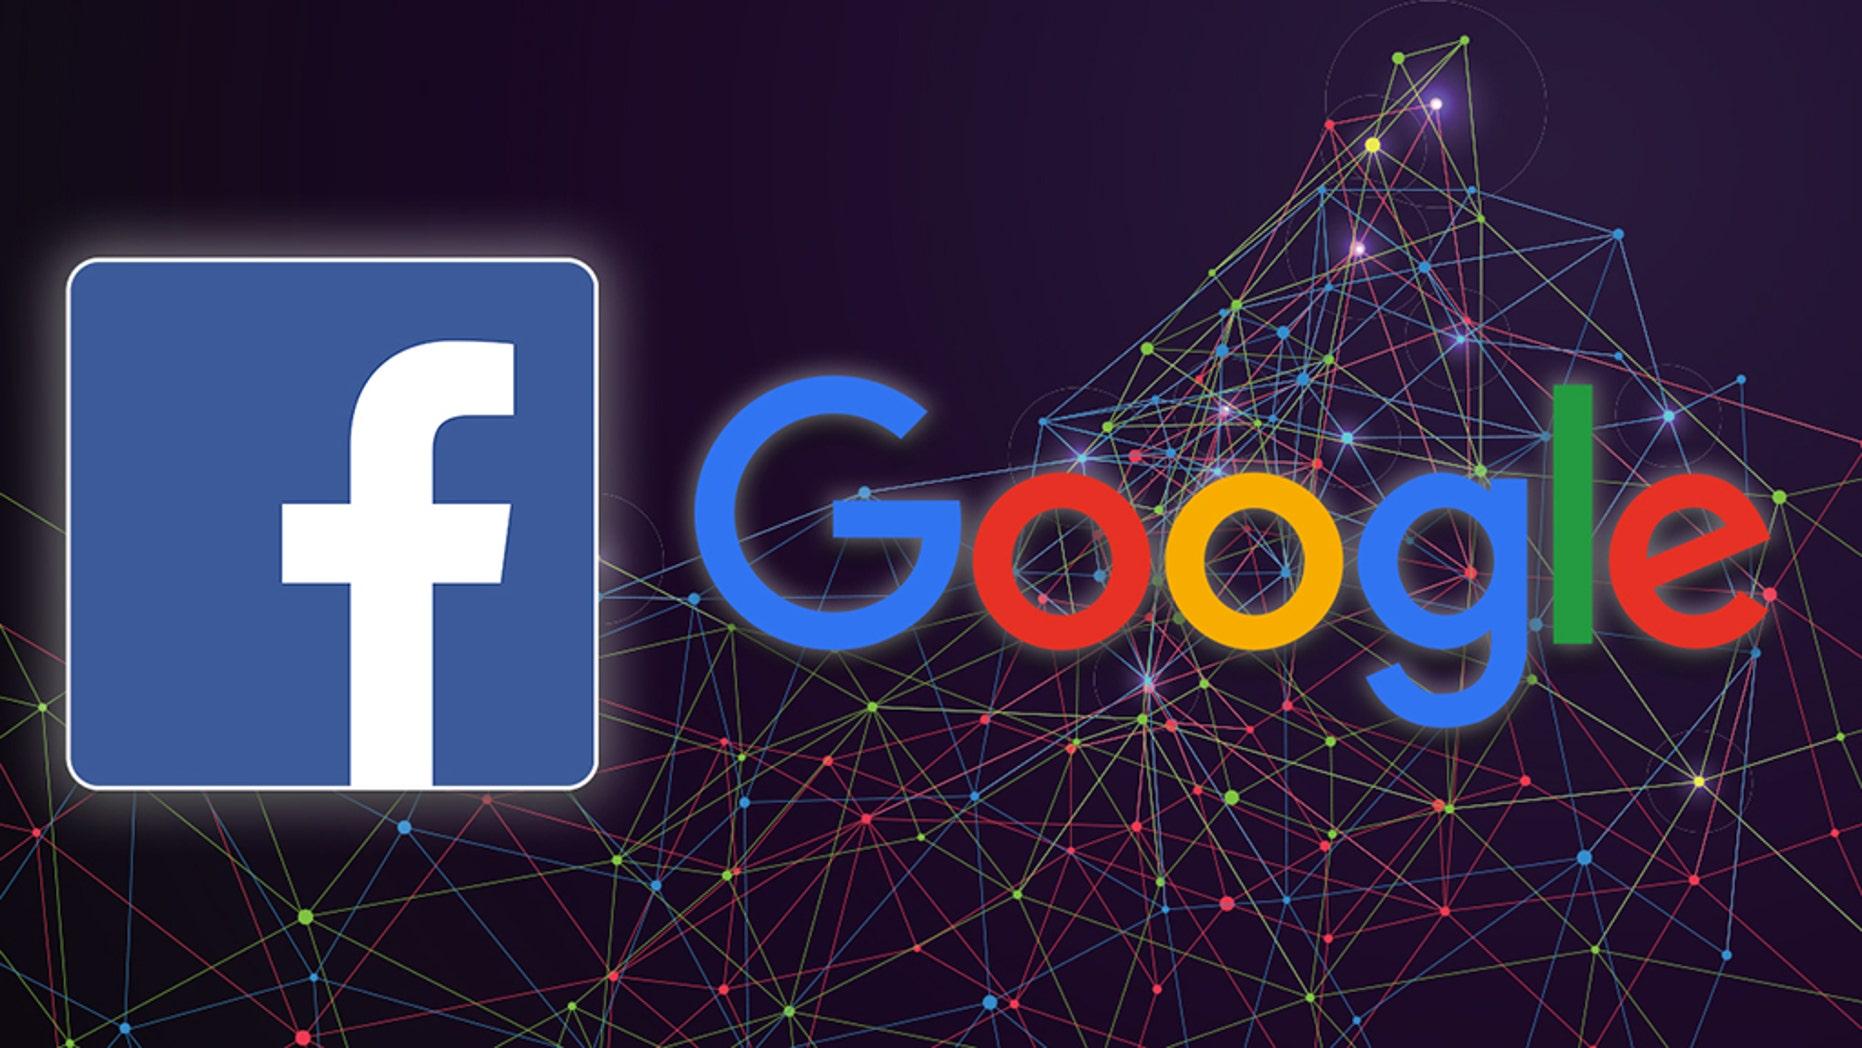 John Stossel: Google and Facebook cross 'The Creepy Line' of